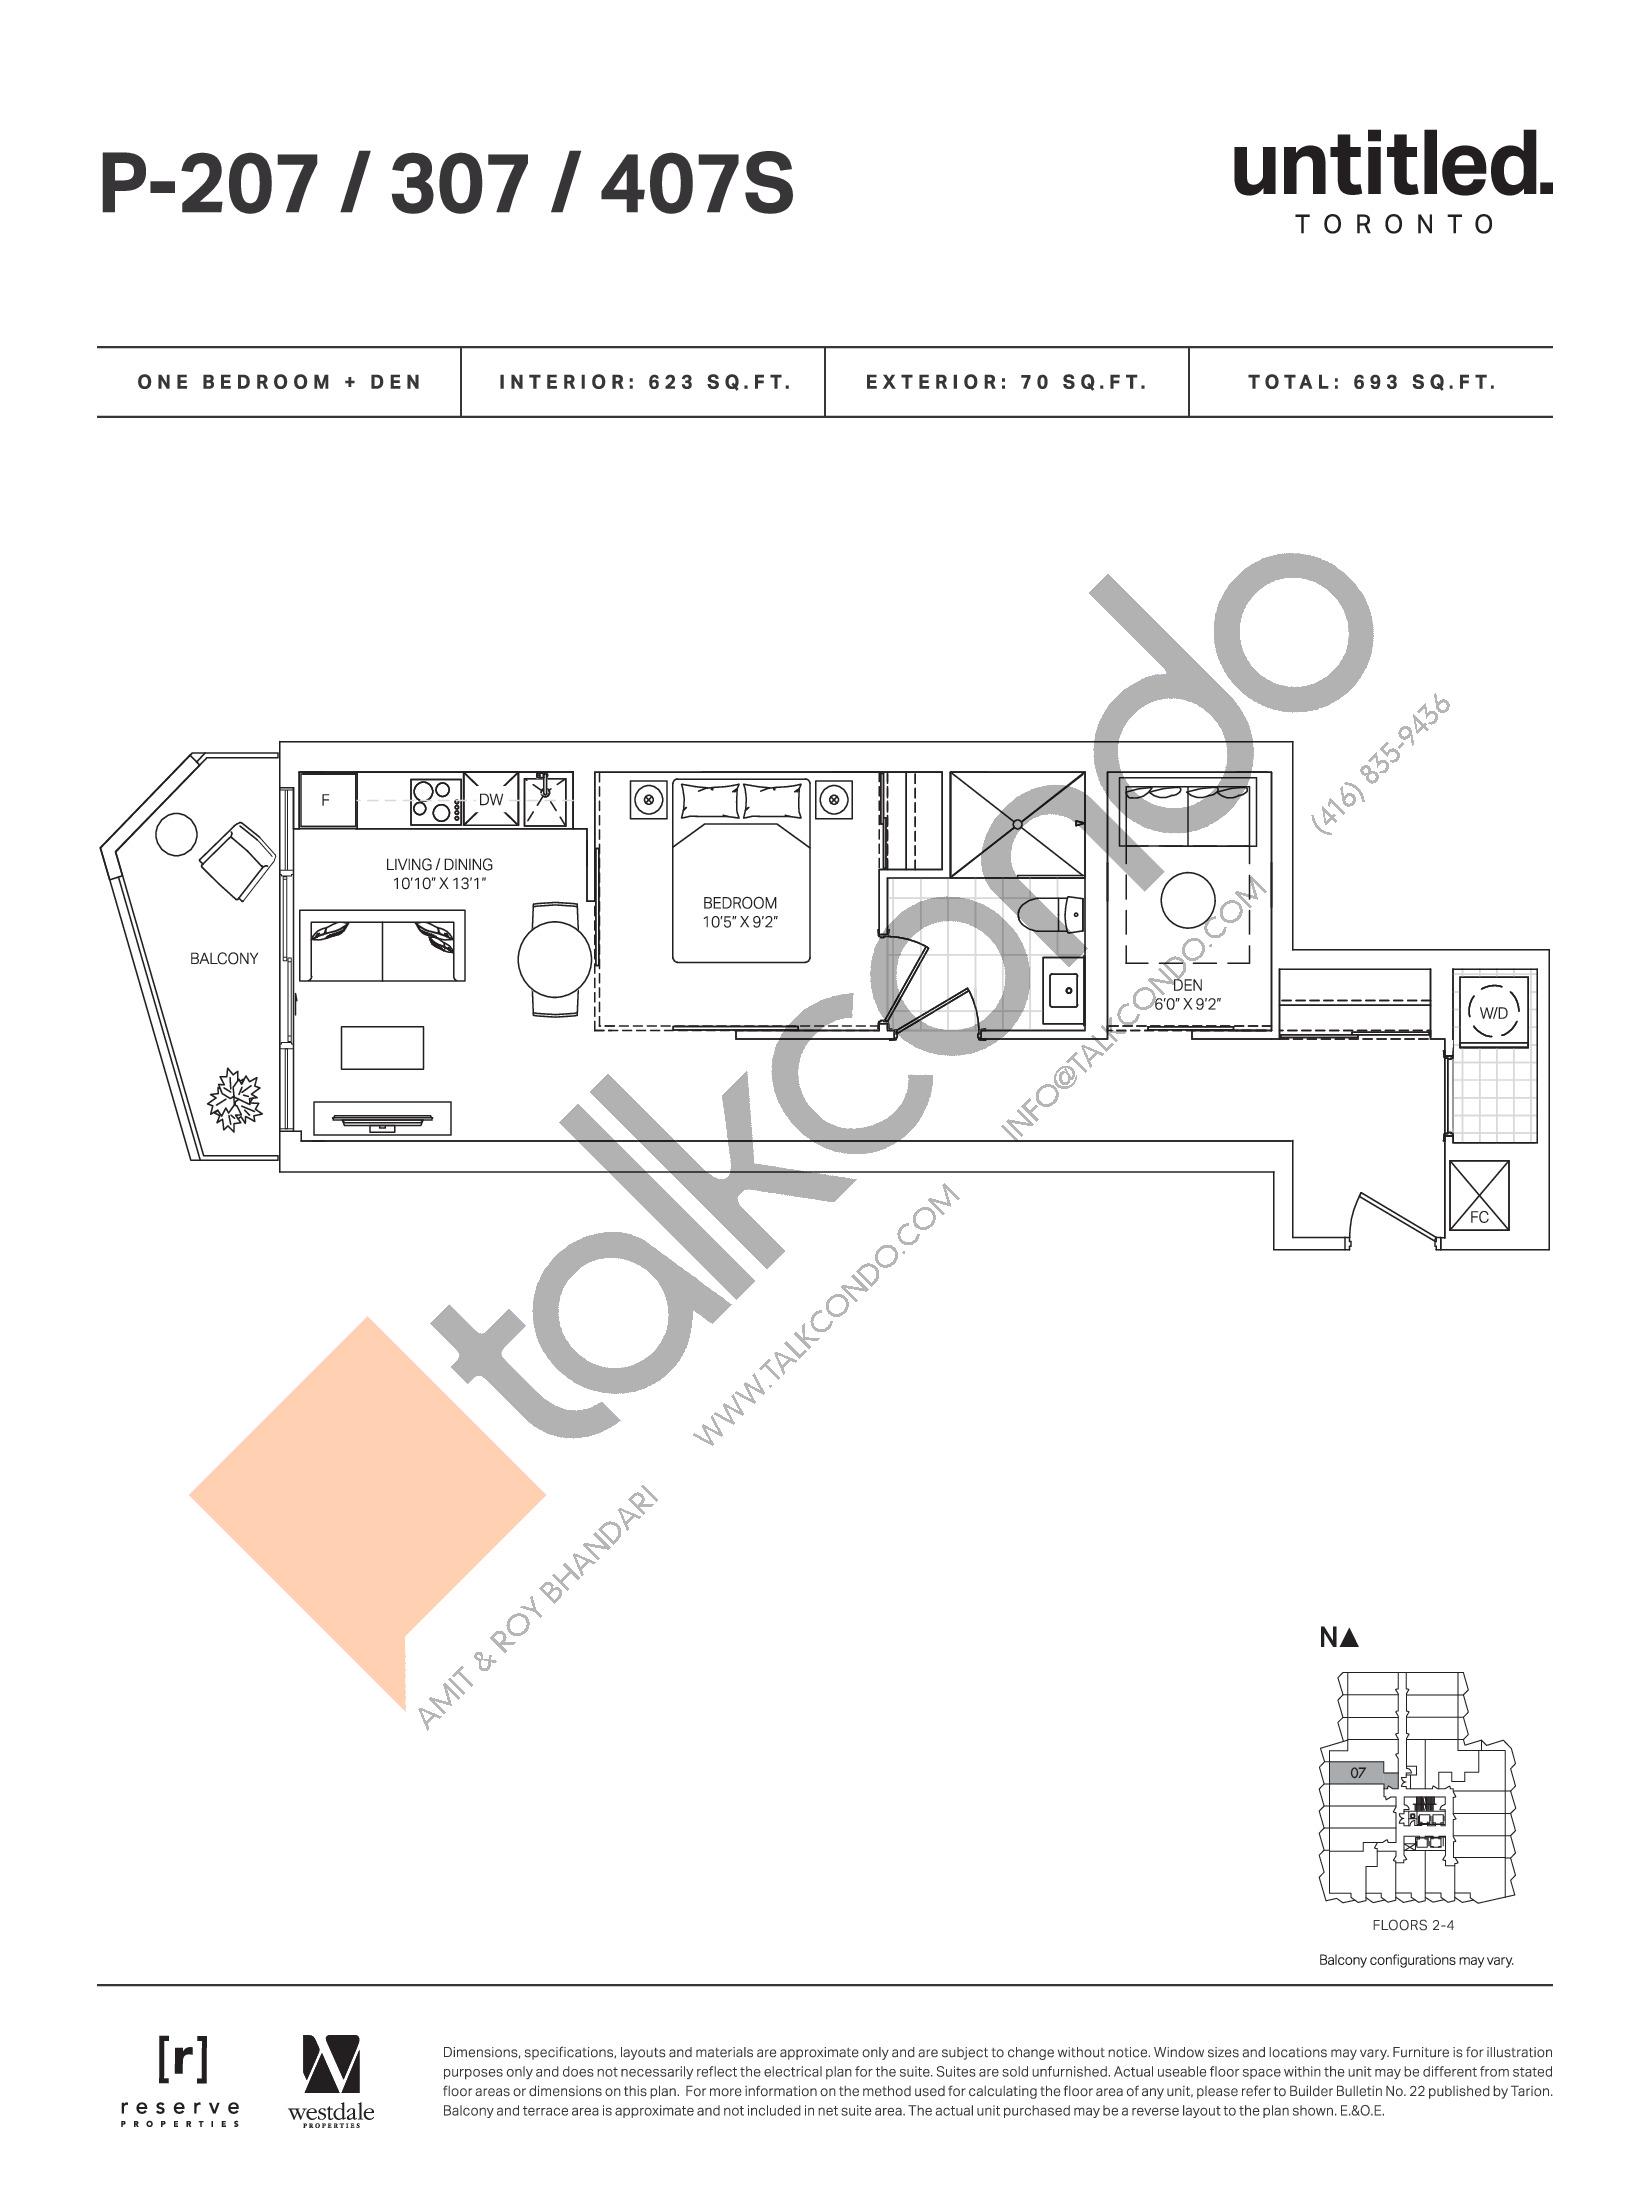 P-207 / 307 / 407S Floor Plan at Untitled Toronto Condos - 623 sq.ft